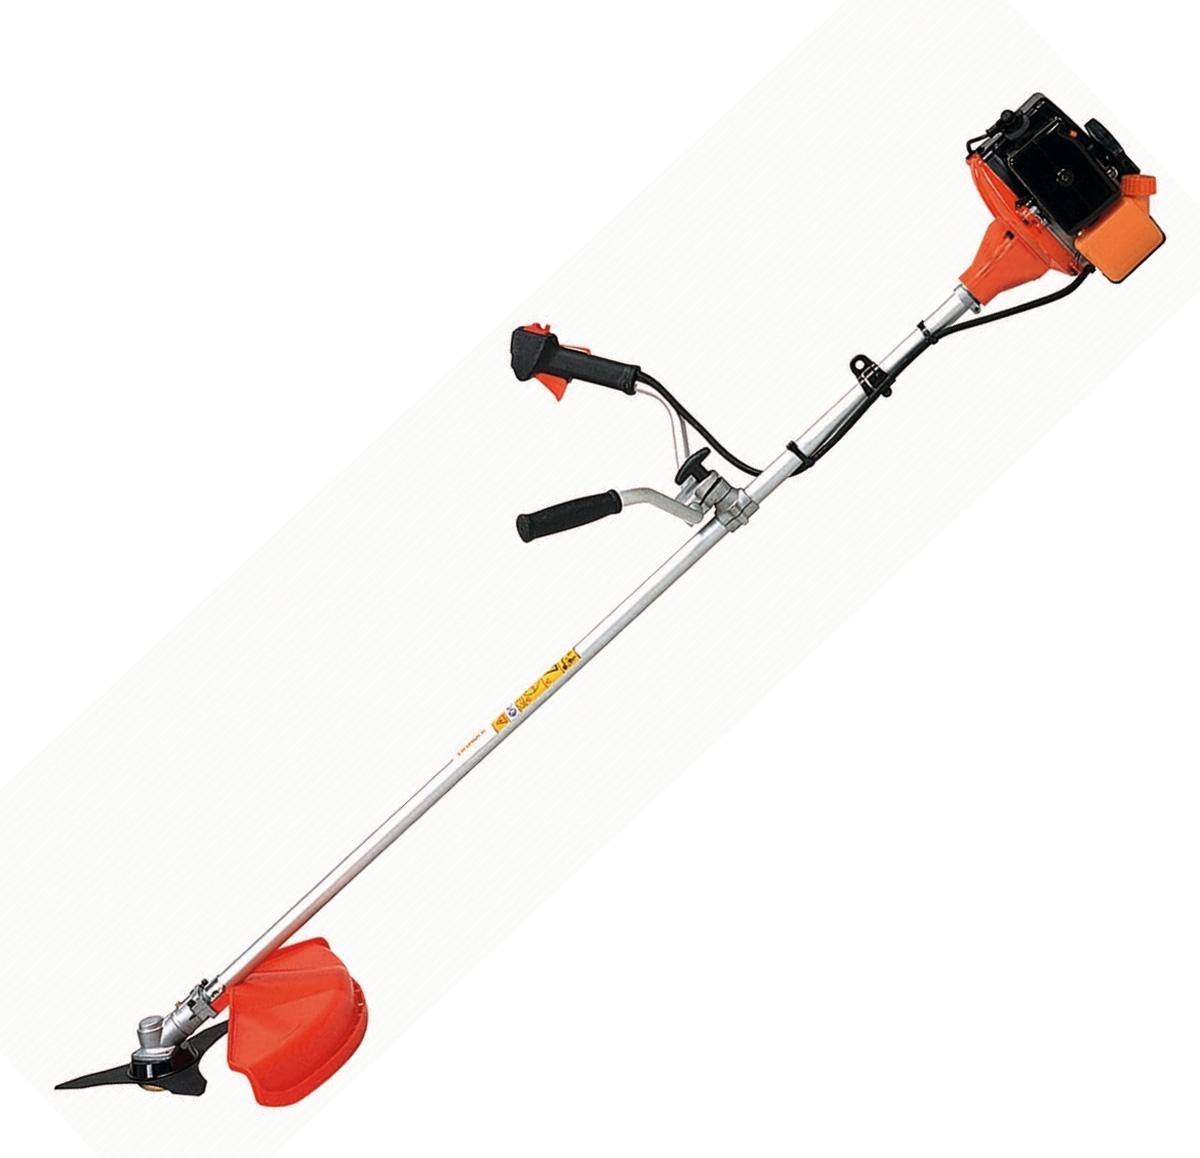 Hitachi CG47EJ(T) Brushcutter Image